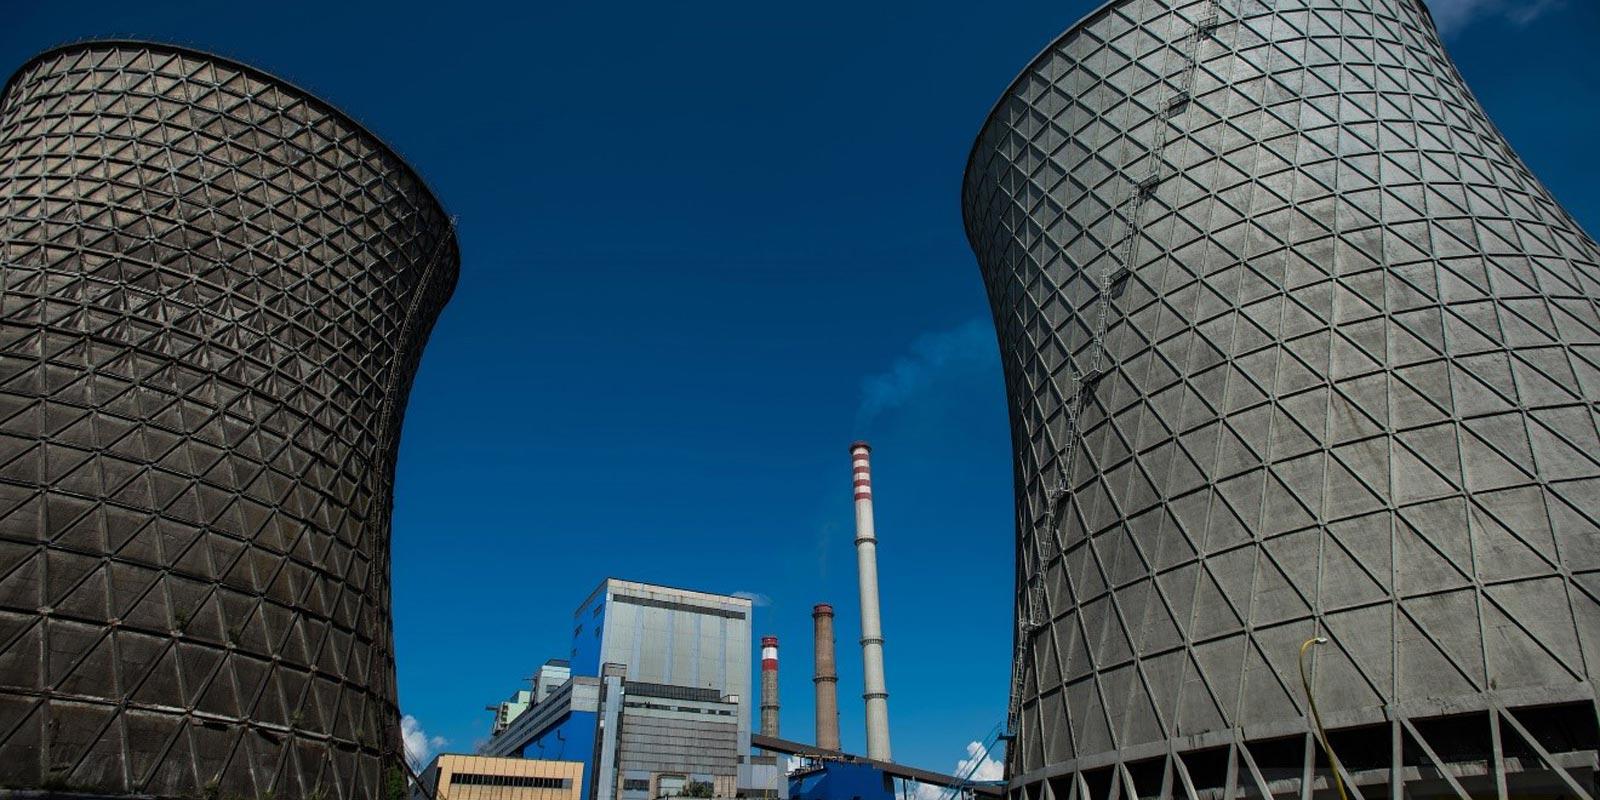 BiH2.0: Energetika / Energy cover image